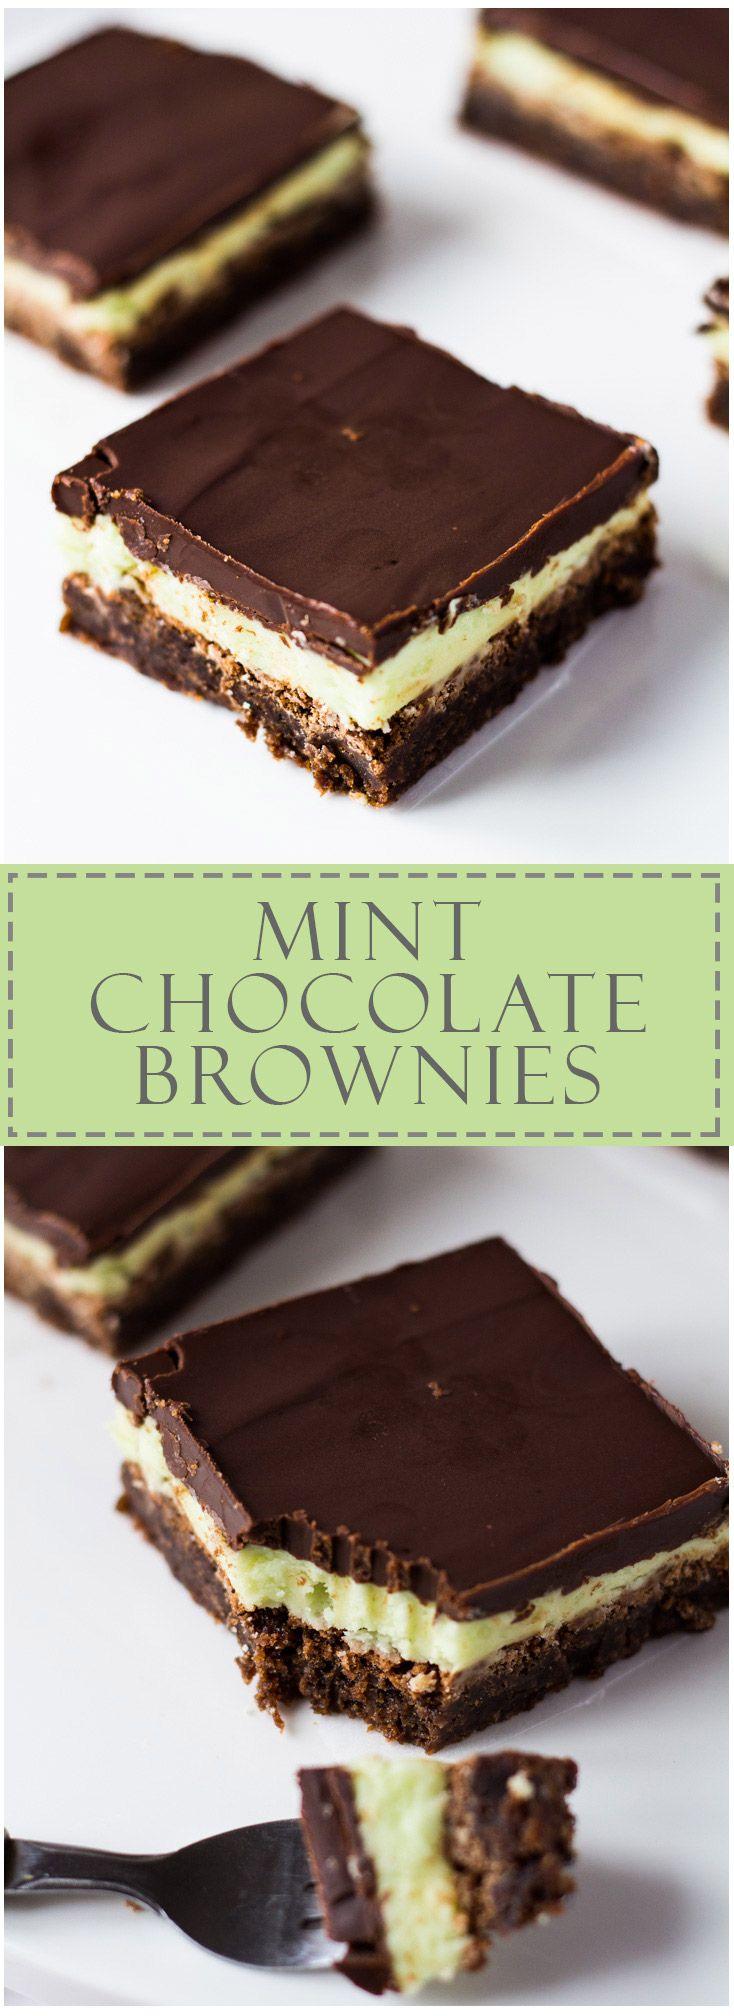 Mint Chocolate Brownies | Marsha's Baking Addiction